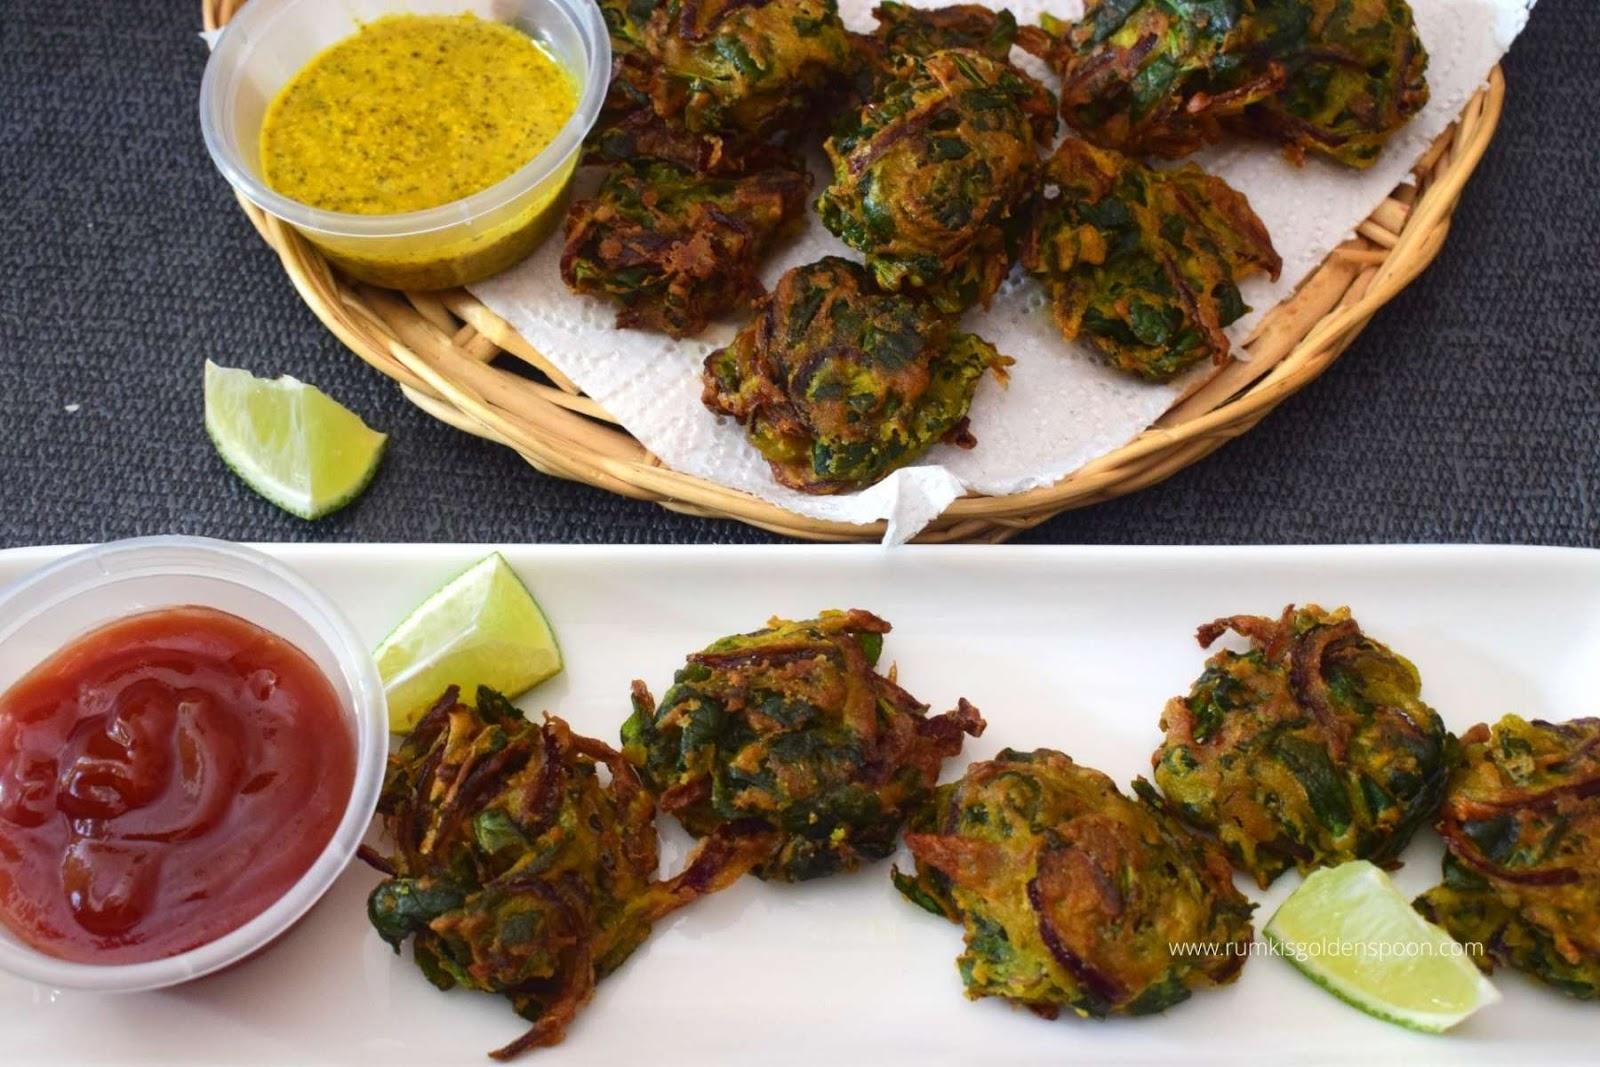 palak pakoda, palak pakoda recipe, recipe for palak pakoda, palak pakoda ki recipe, palak pakora, how to make palak pakoda, palak pakora recipe, recipe of palak pakora, spinach pakora, spinach pakora recipe, spinach pakora recipe Indian, spinach fritters, how to make spinach pakora, spinach pakoda, palak bhaji recipe, palak bhajia, palak recipe, palak recipes, palak recipe Indian, Indian recipe with spinach, spinach recipe Indian, snacks recipe, snack recipe, Indian snack recipe, recipe for vegan snacks, recipe for pakoda, pakoda recipe, vegan snacks recipe, indian recipe for snacks, Indian snacks recipe, Rumki's Golden Spoon